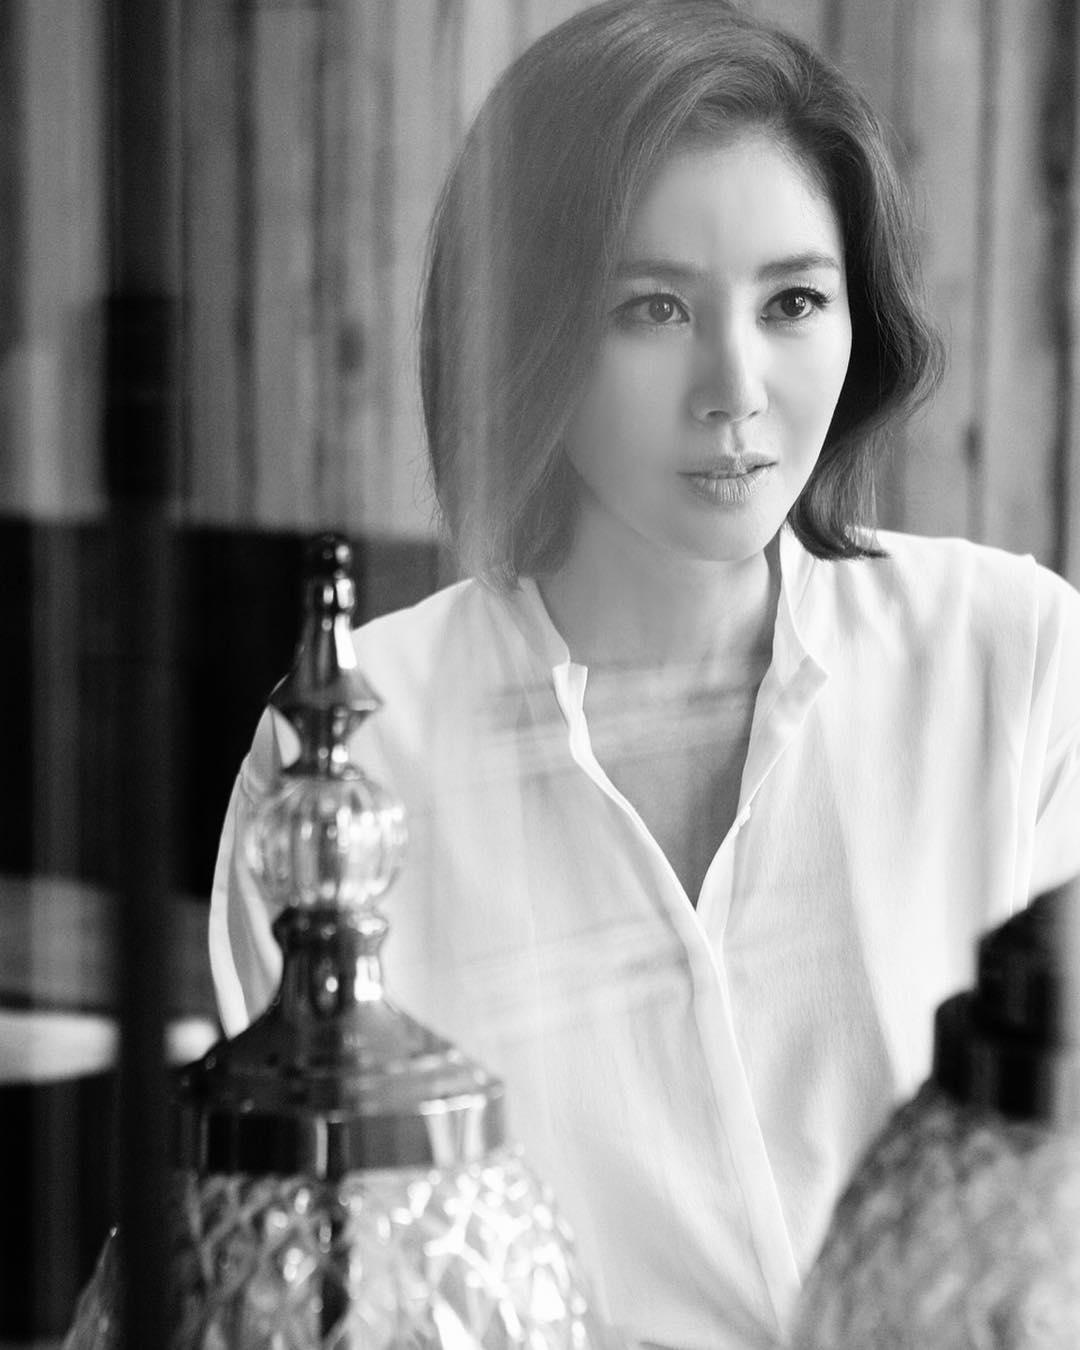 Ảnh: Instargam @sungryong_kim